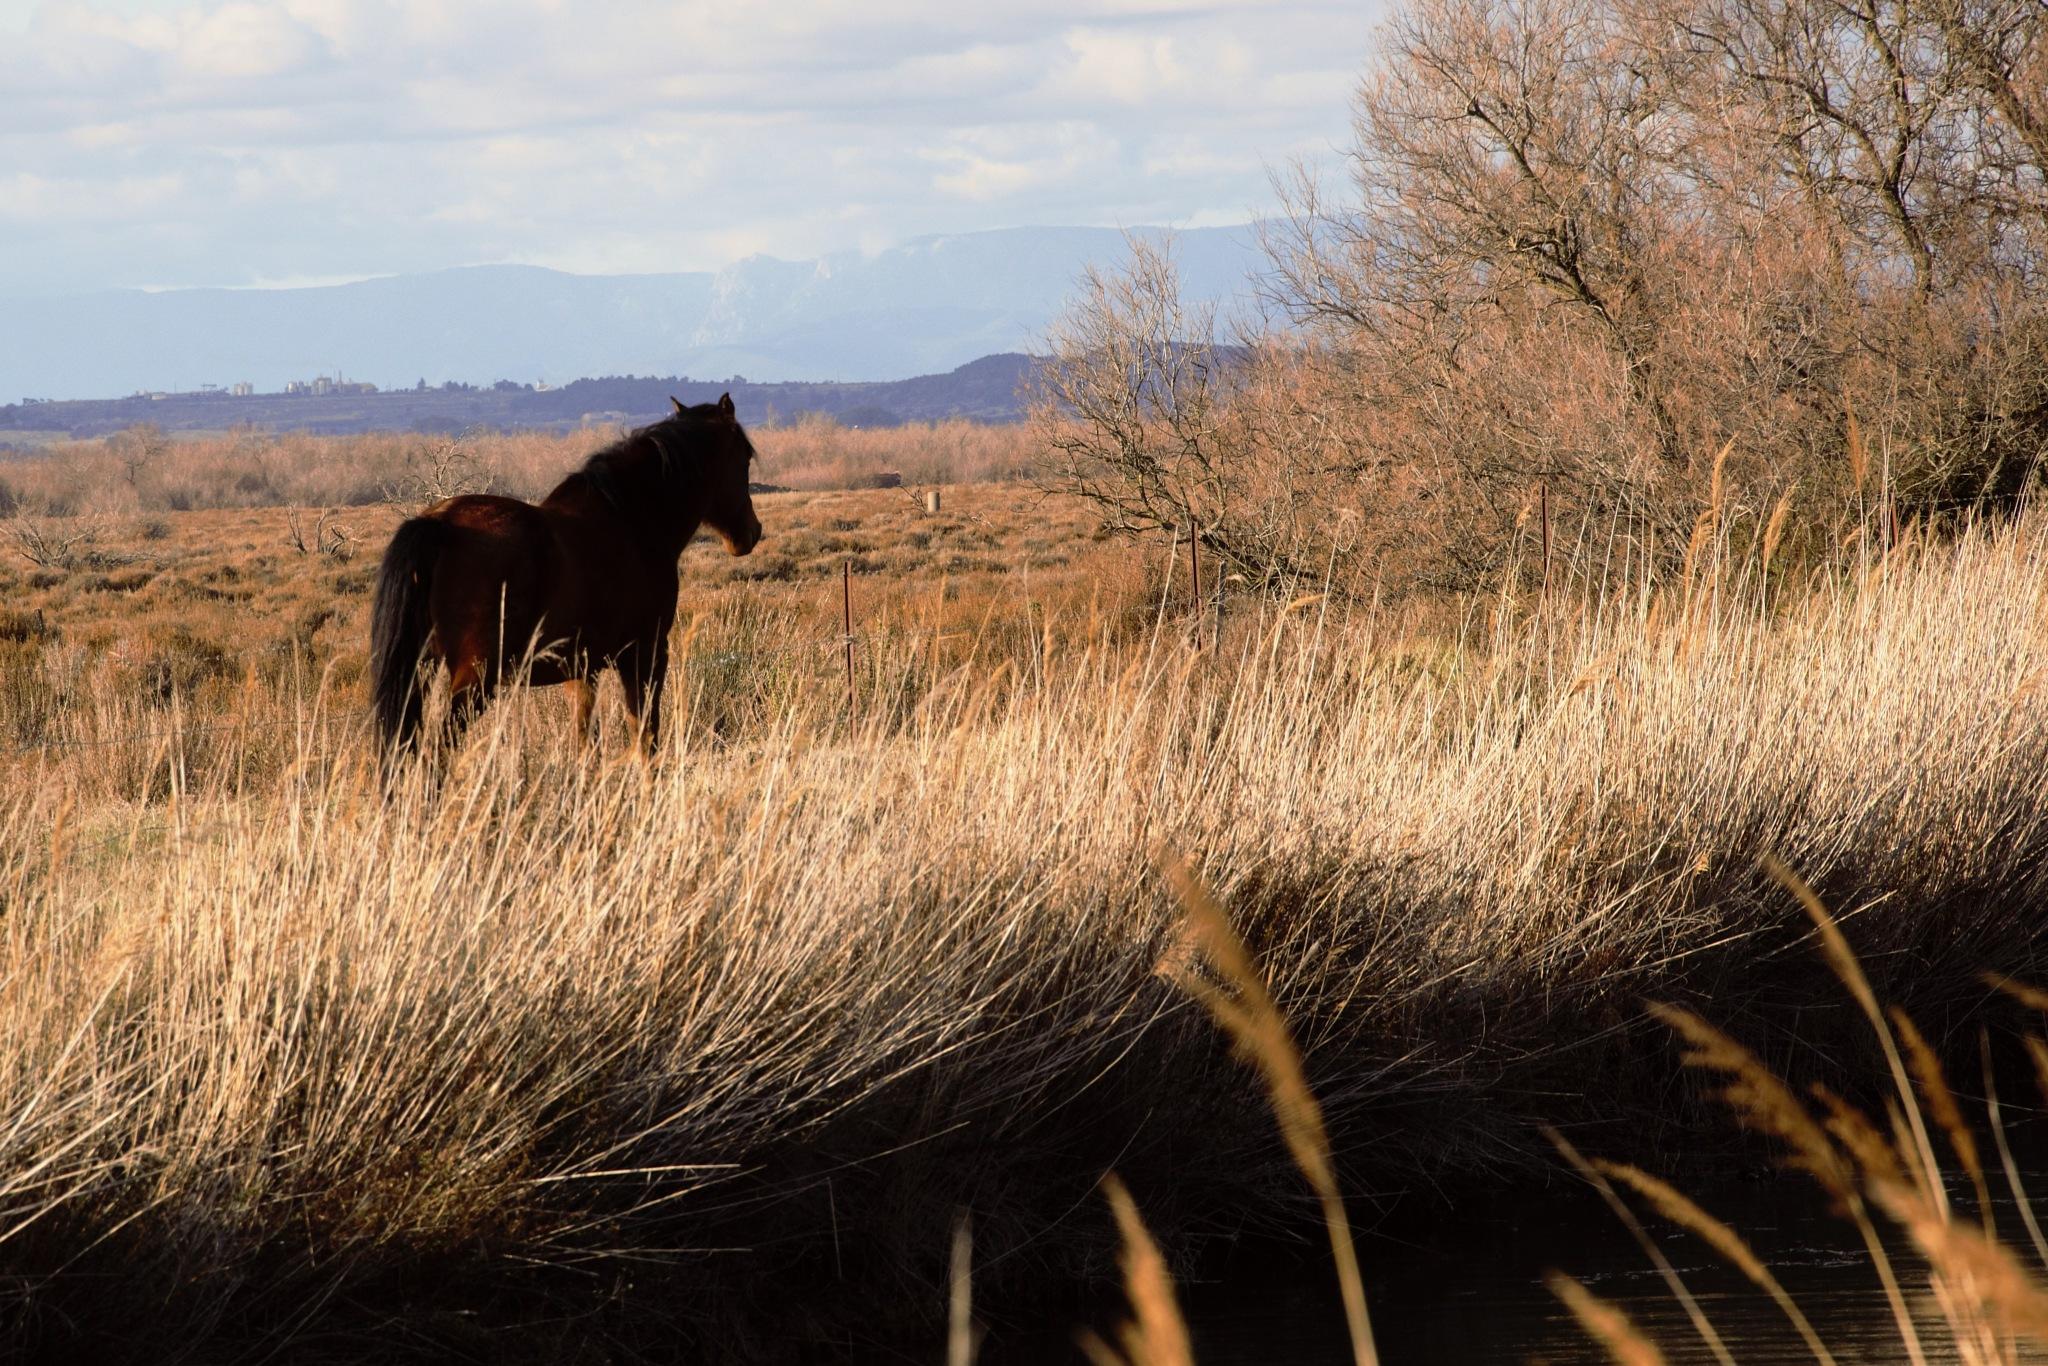 le cheval by rogervande17